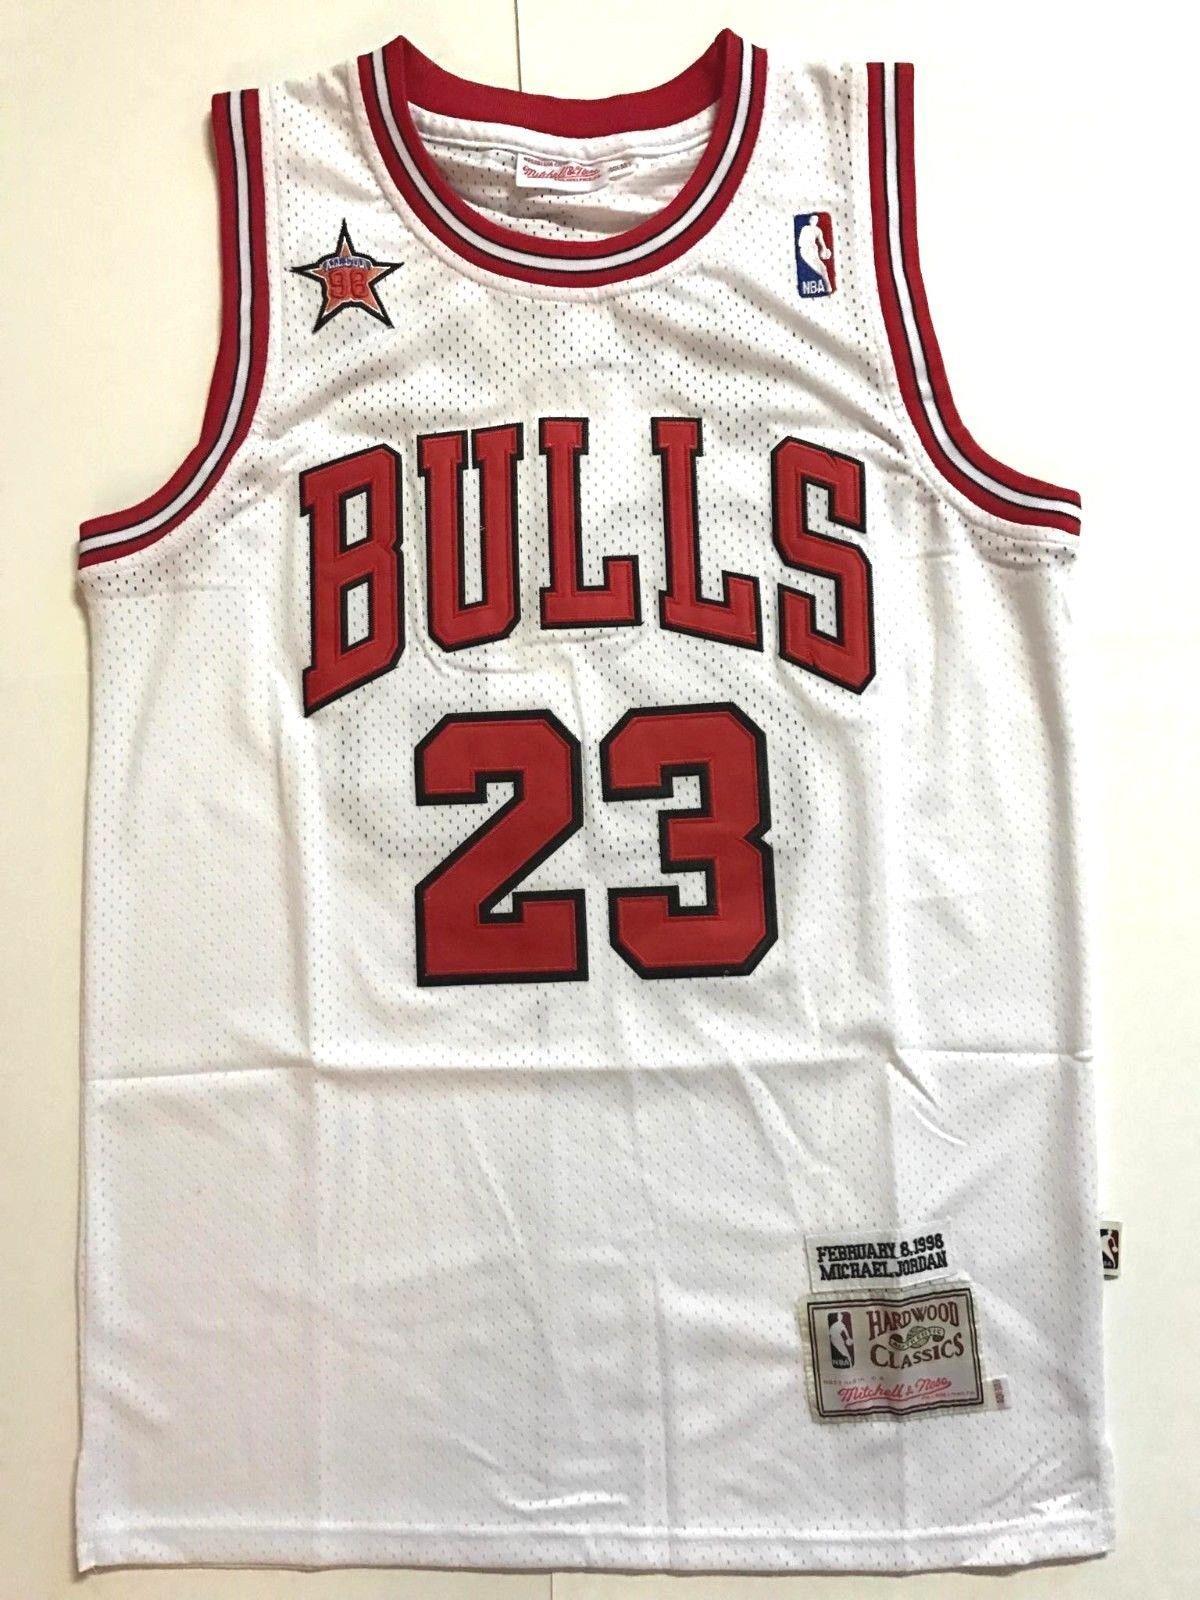 NBA-Jersey-Shirt-Chicago-Bulls-Michael-Jordan-No23-Black-White-Red miniatura 8